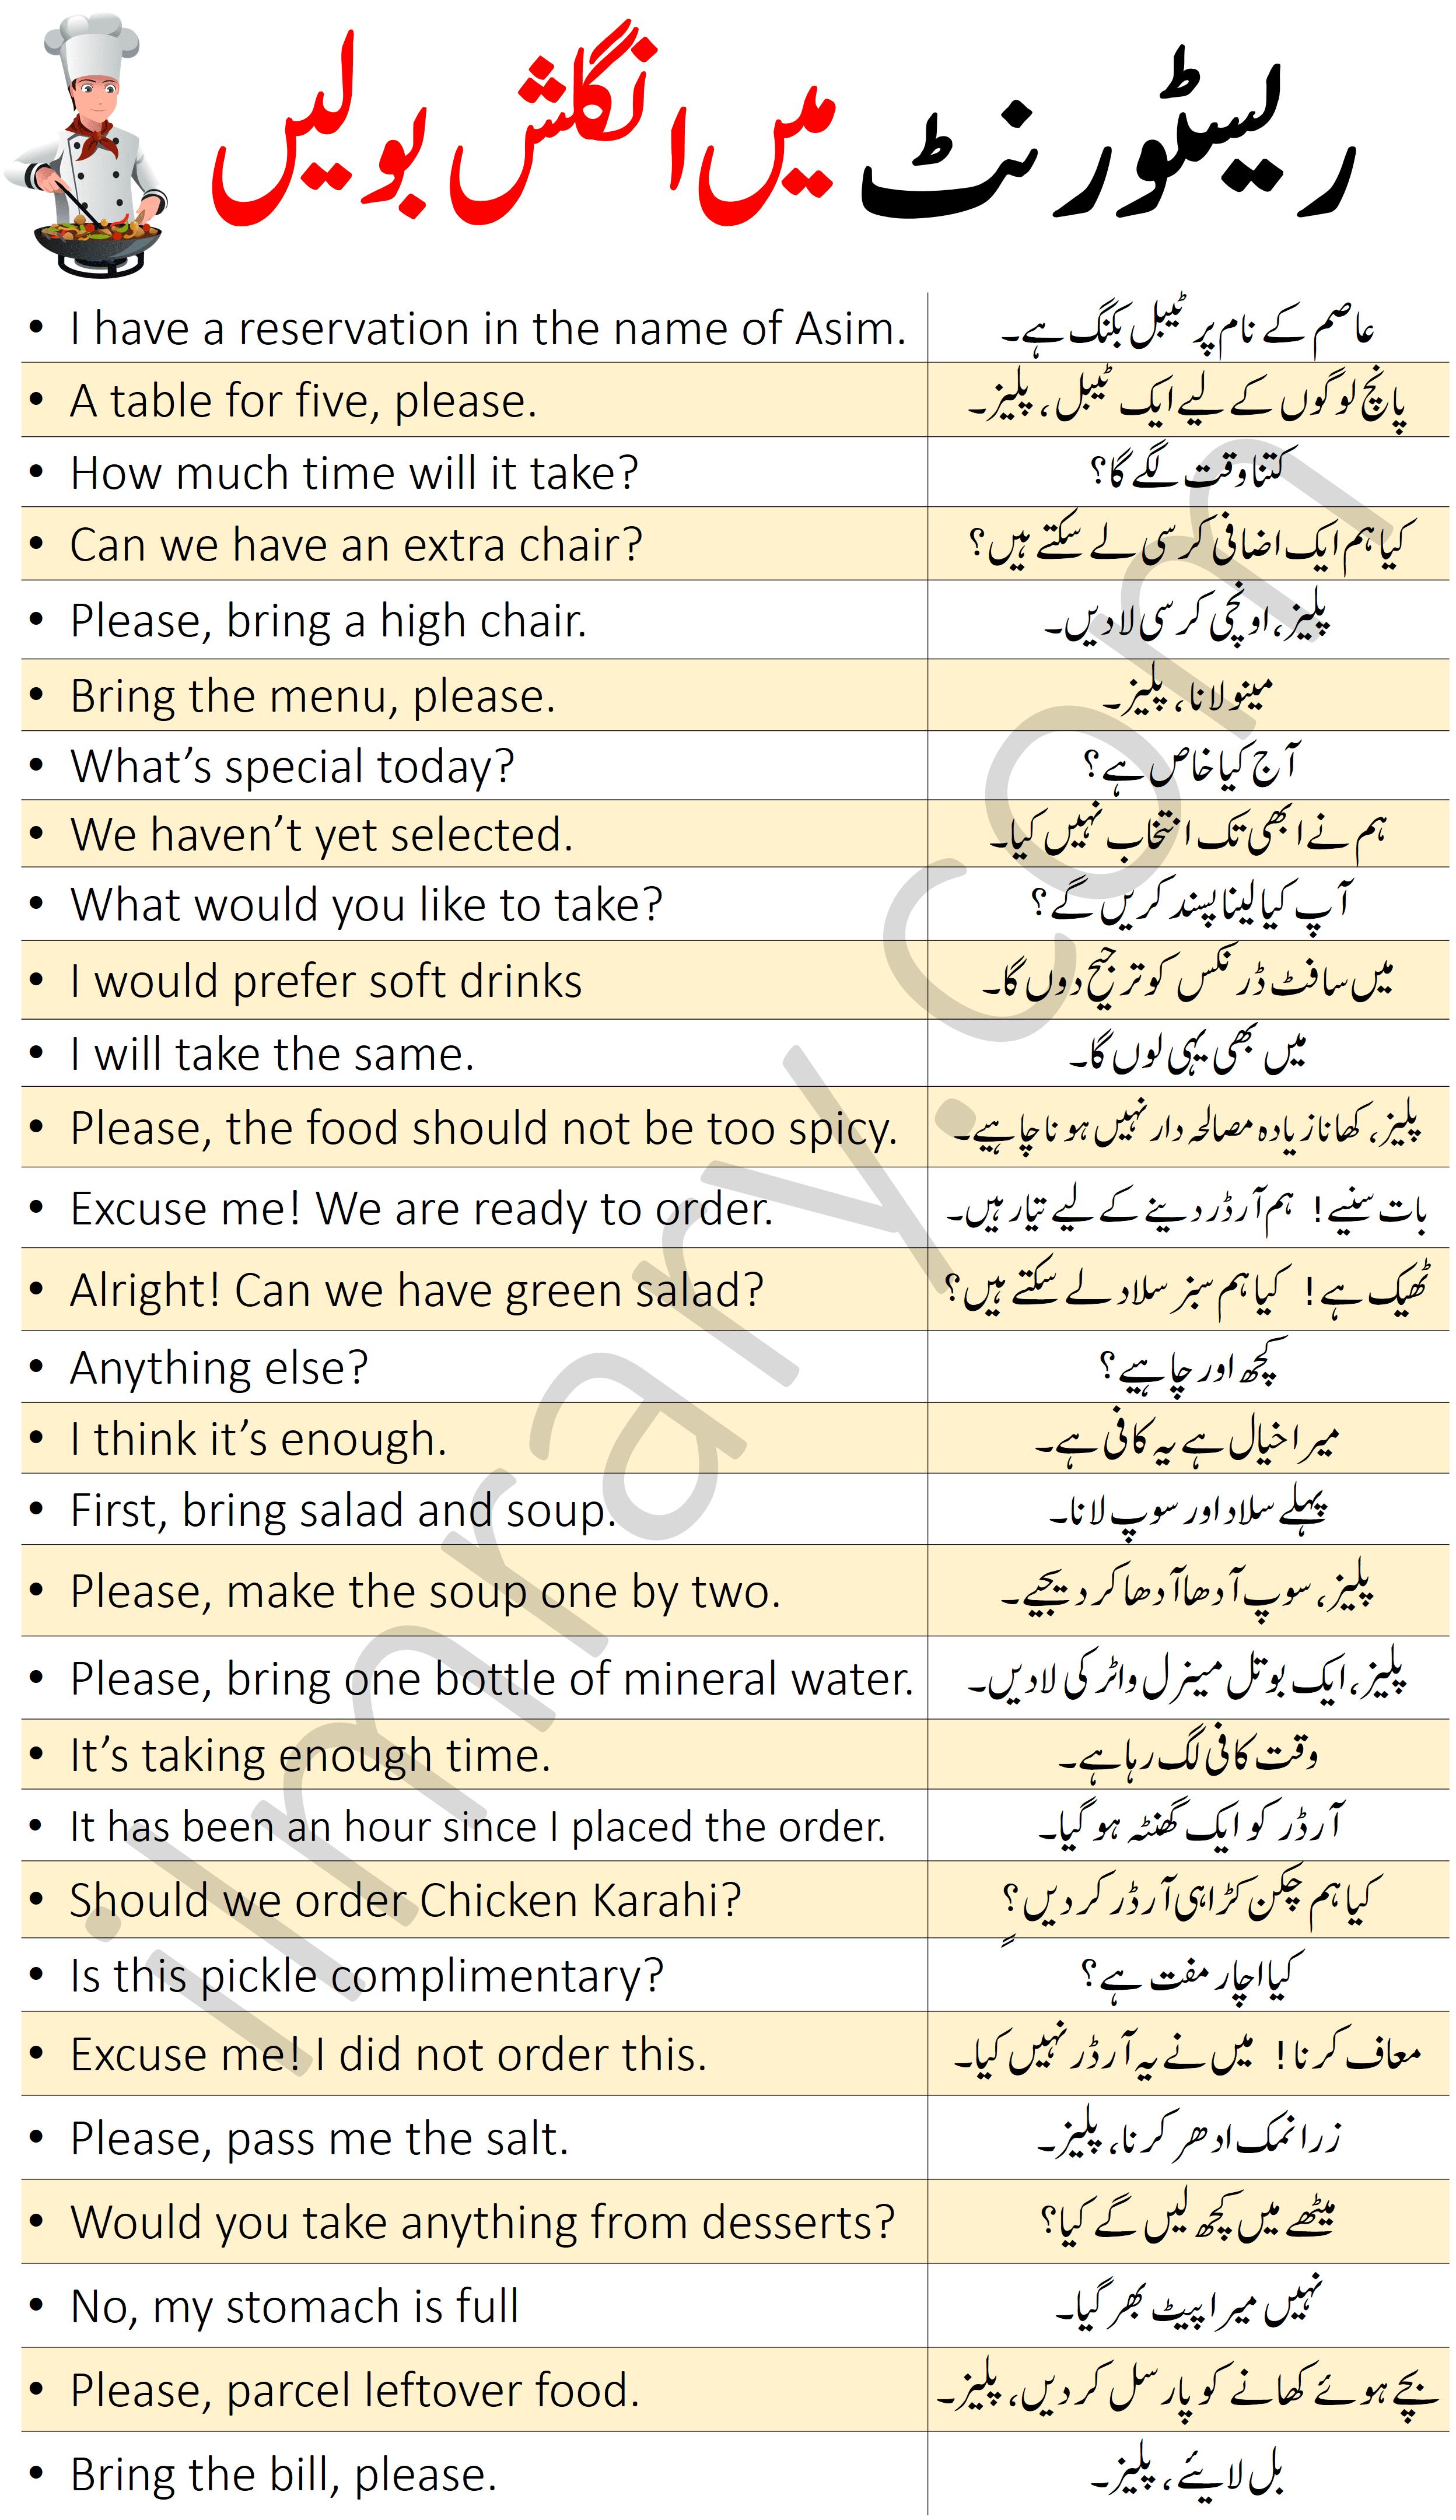 30 Daily English Sentences for Restaurant in Urdu PDF